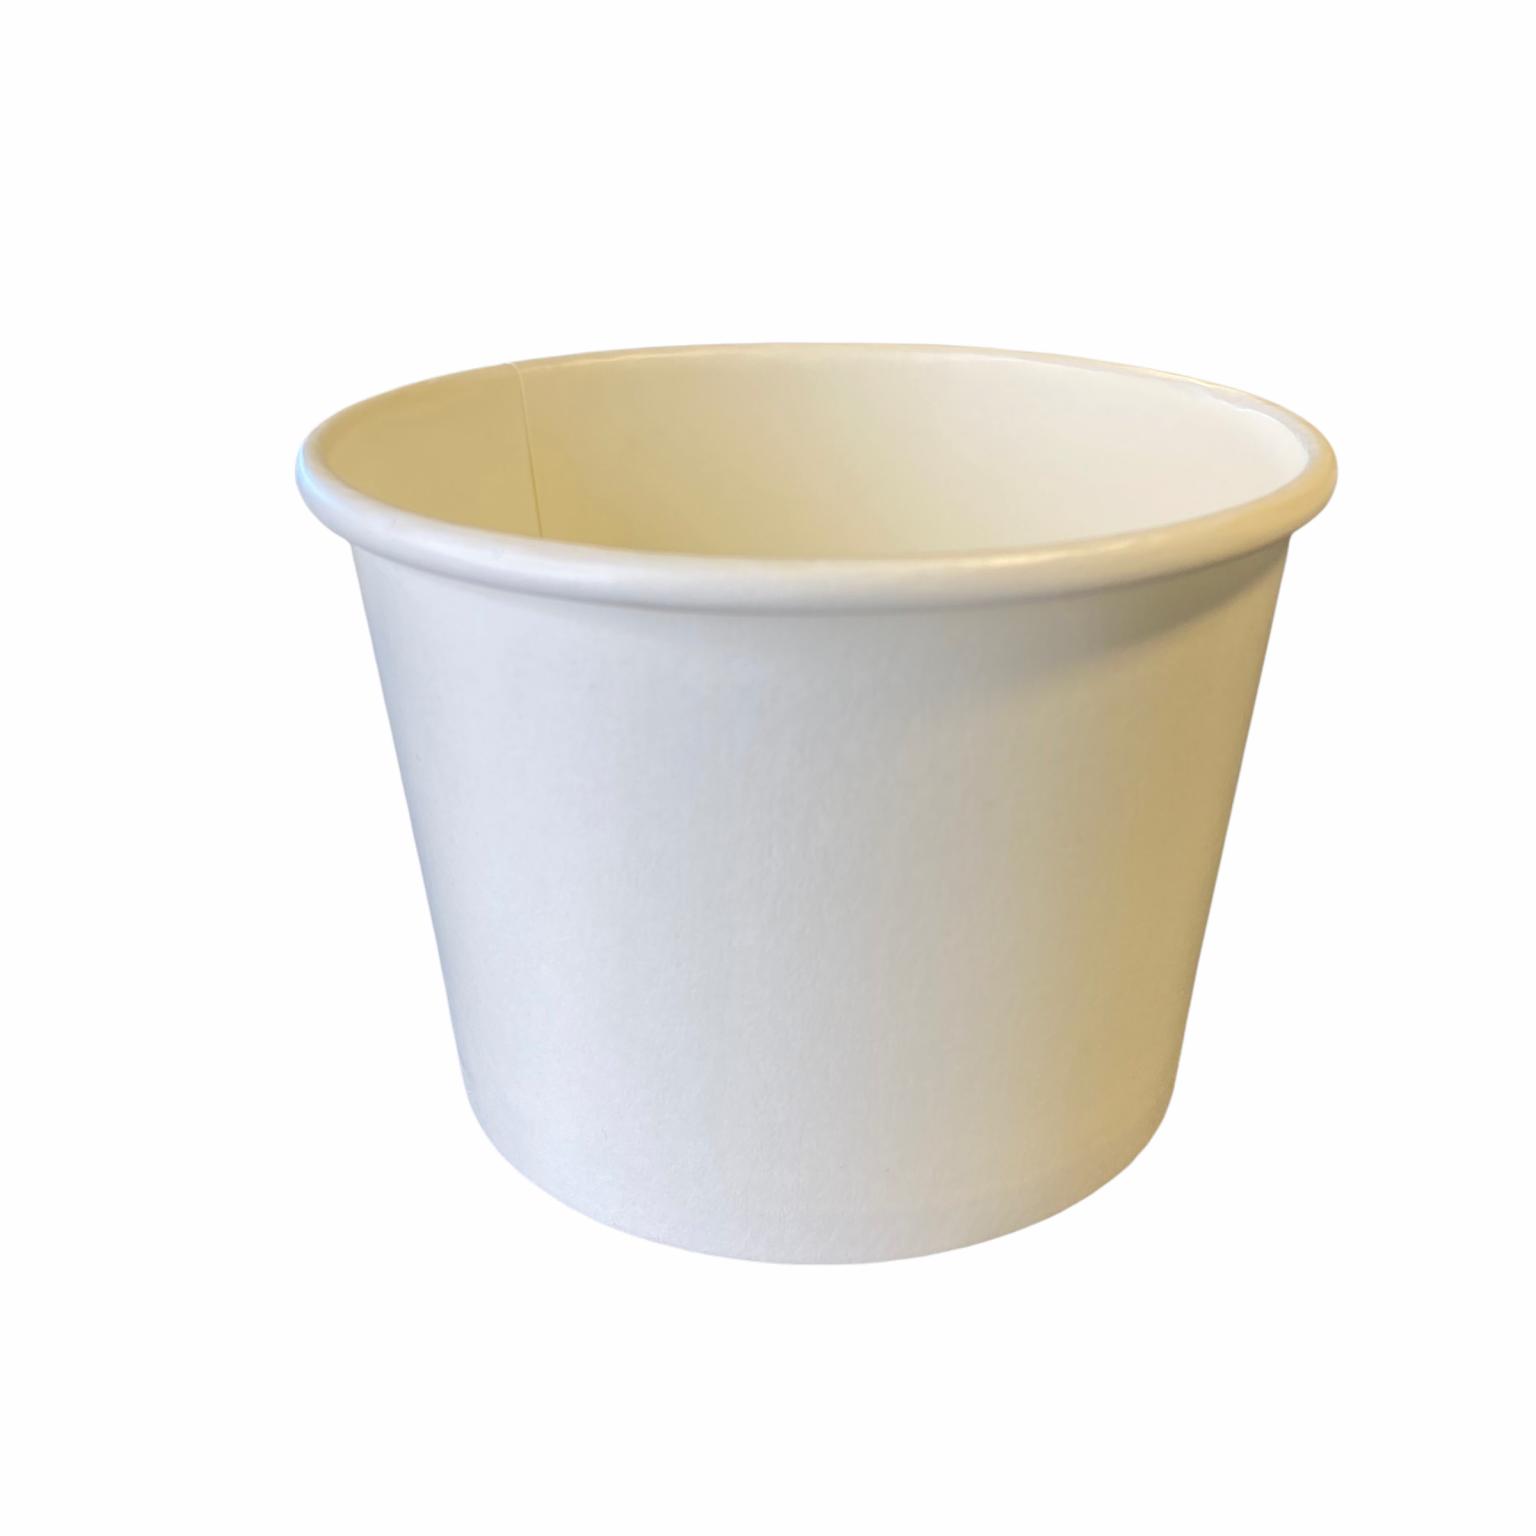 Karton PE ijsbeker wit 360 ml 12 oz 99 mm Ø 70 mm hoog